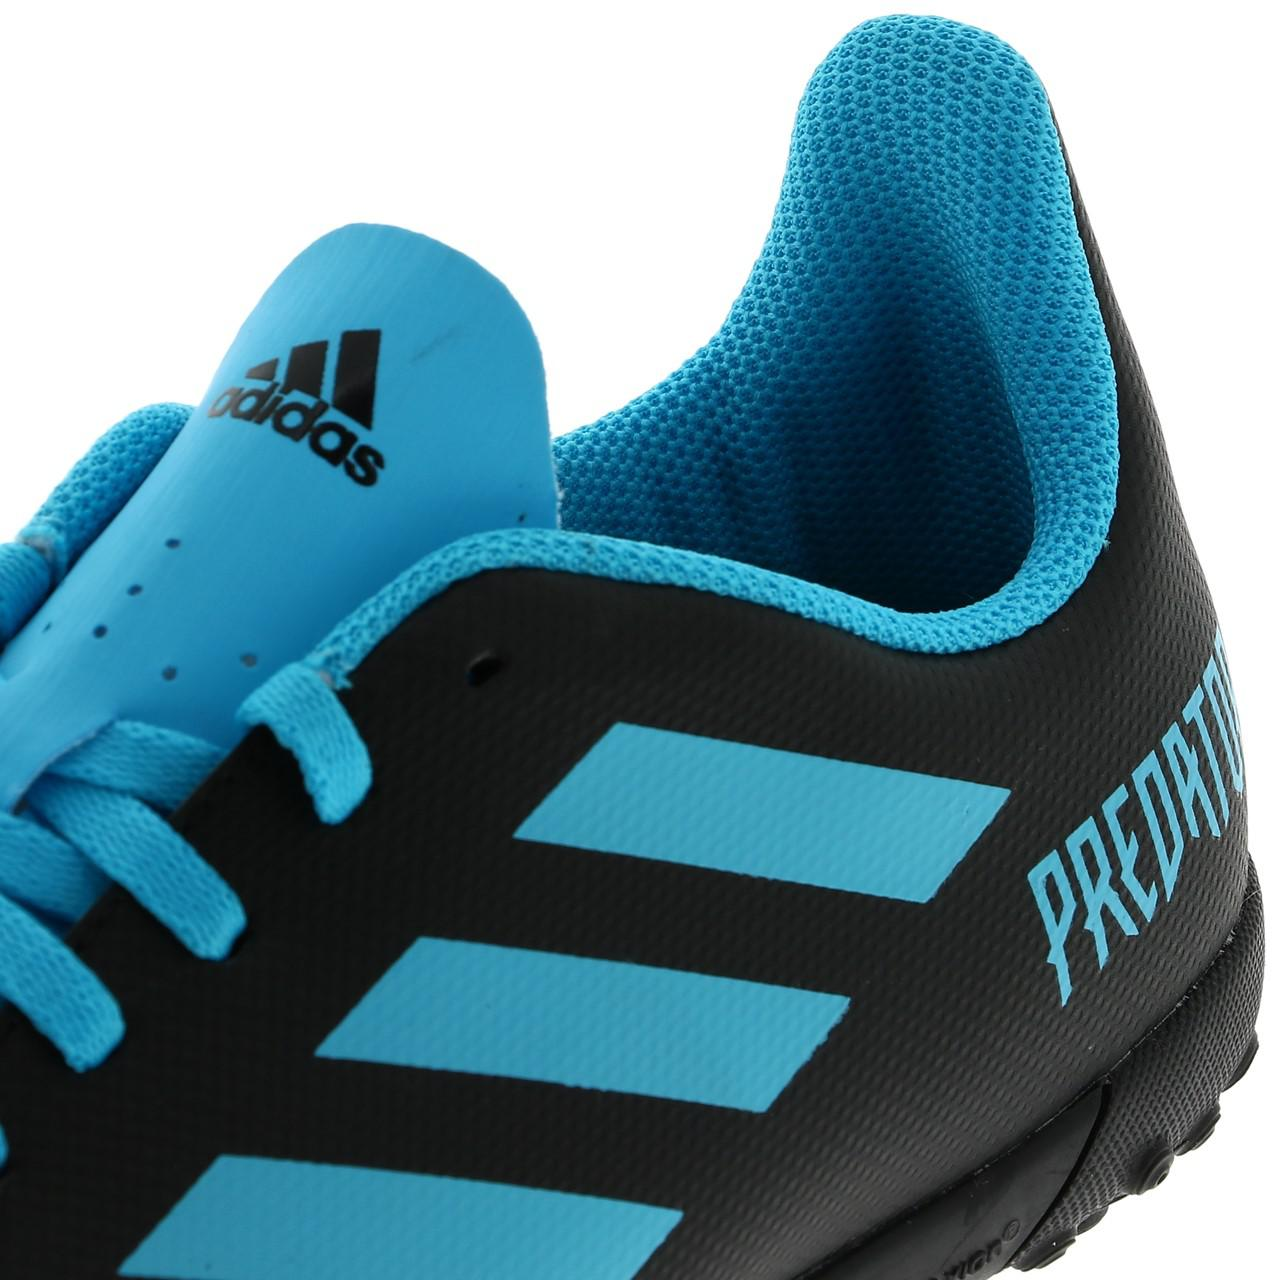 Football-Shoes-Stabilized-Adidas-Predator-19-4-Tf-Jmoule-Jr-Black-42177-N thumbnail 2